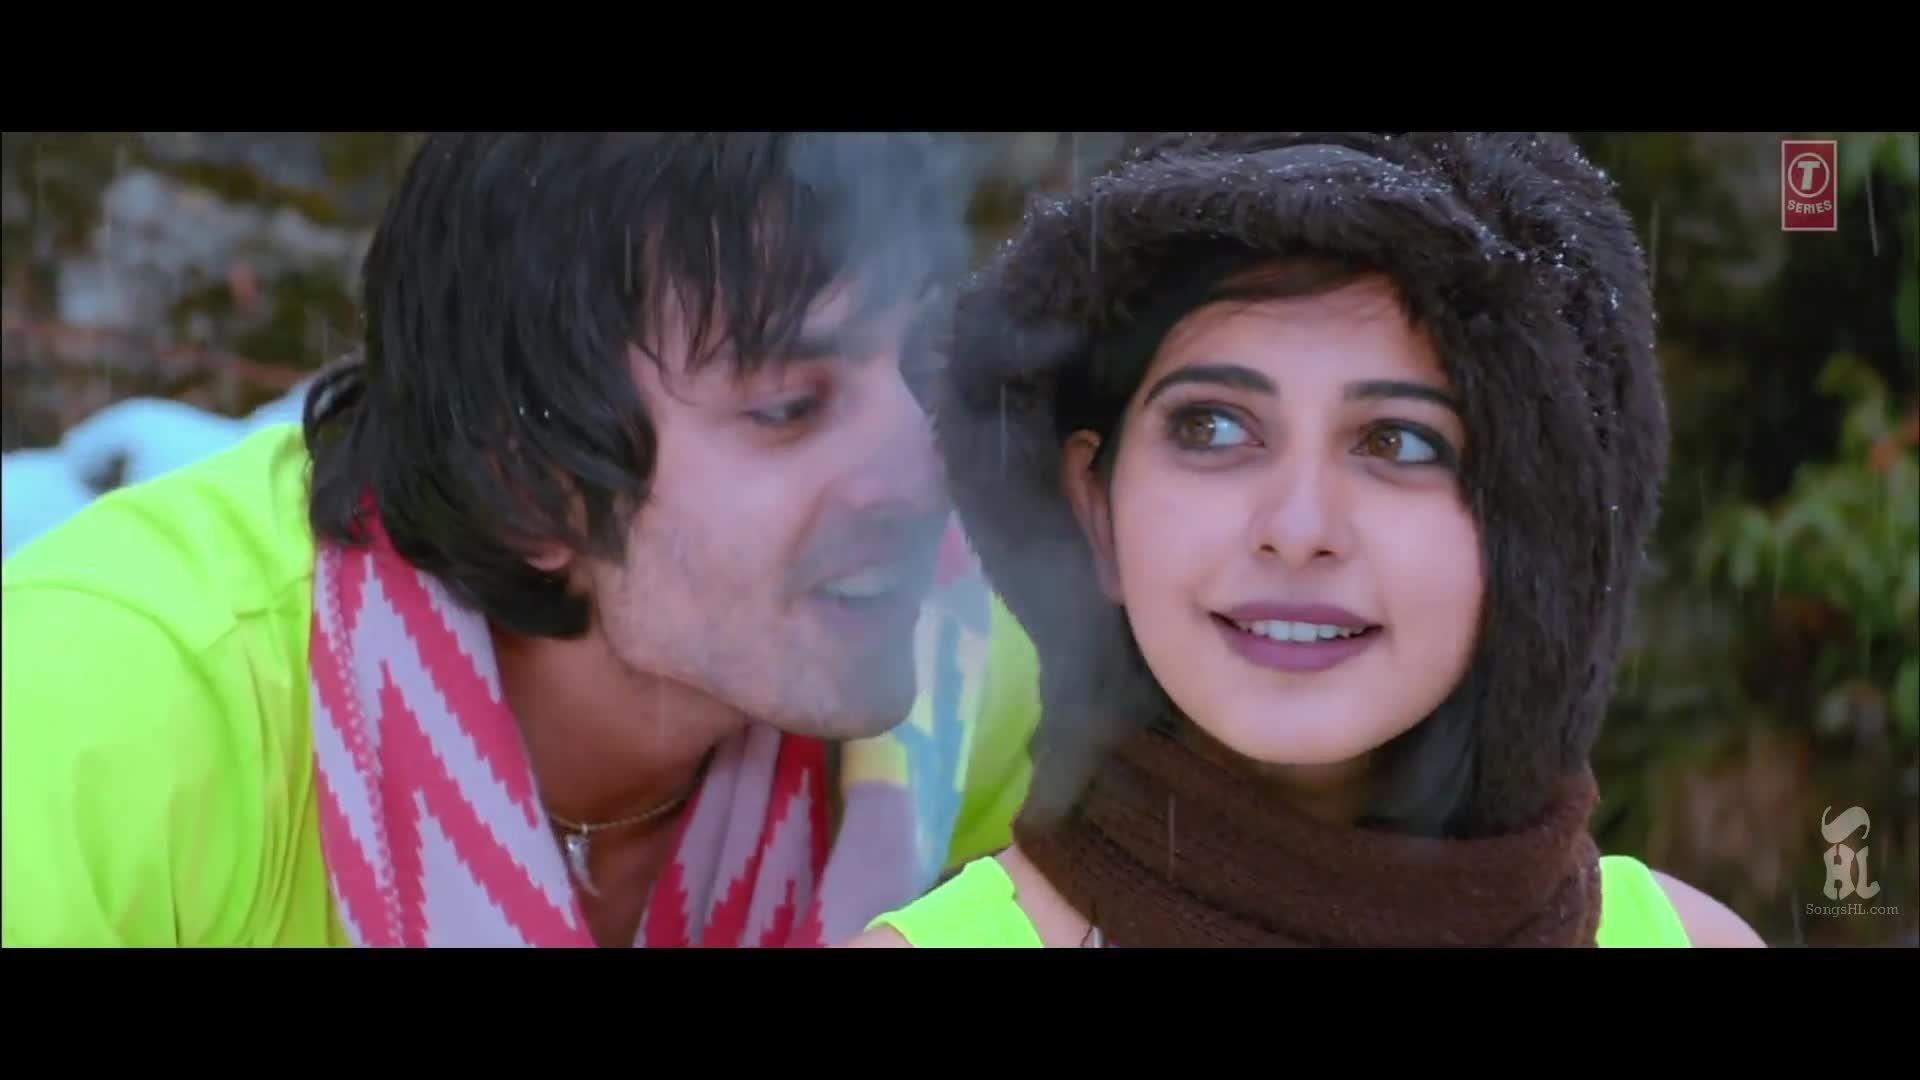 Hd wallpaper yaariyan - Yaariyan Drama Romance Bollywood 26 Wallpaper 1920x1080 378334 Wallpaperup